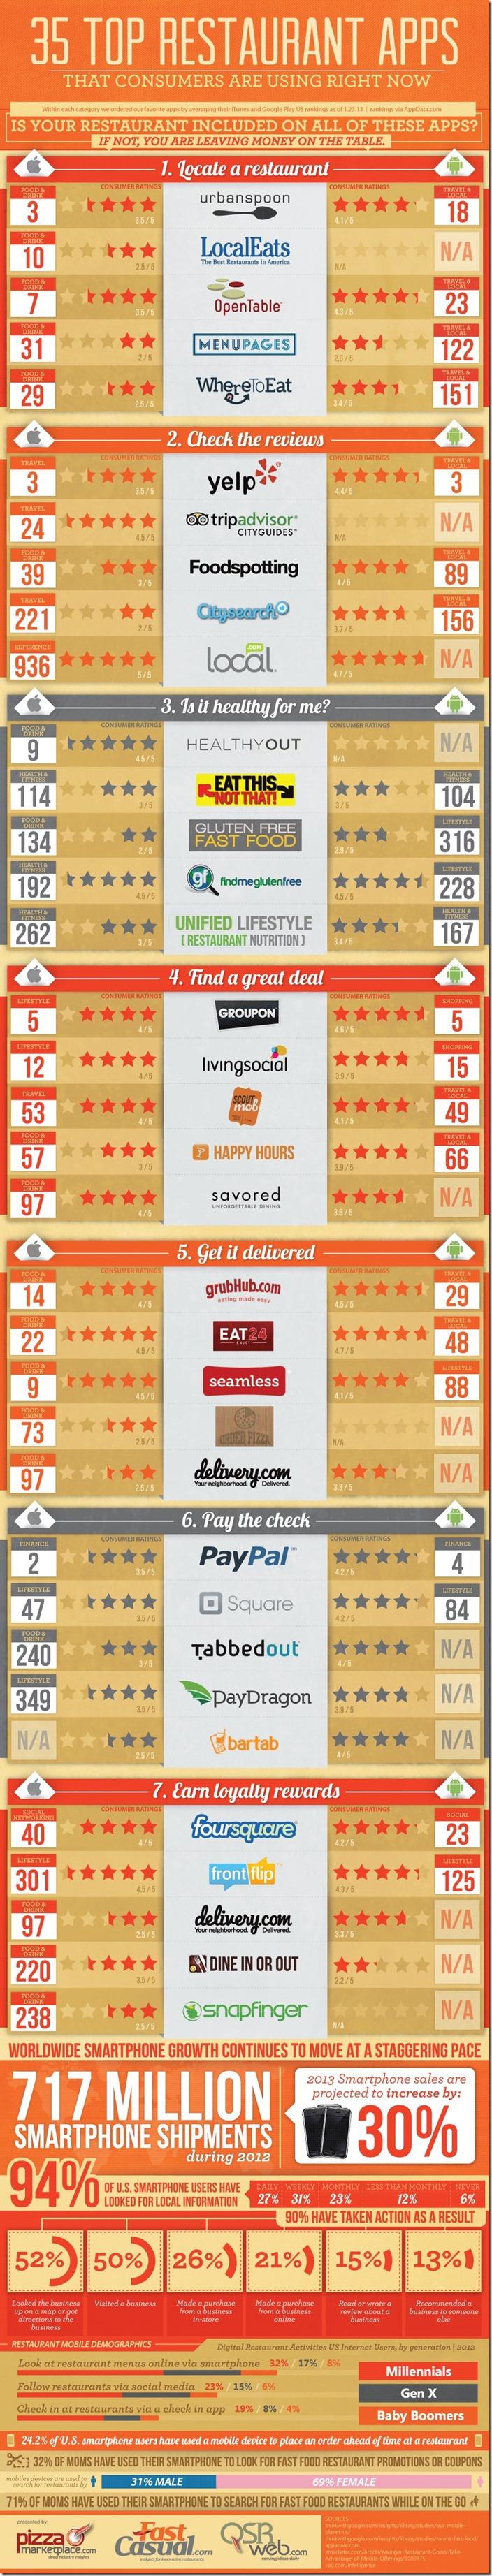 35-Top-Restaurant-Apps-Infographic